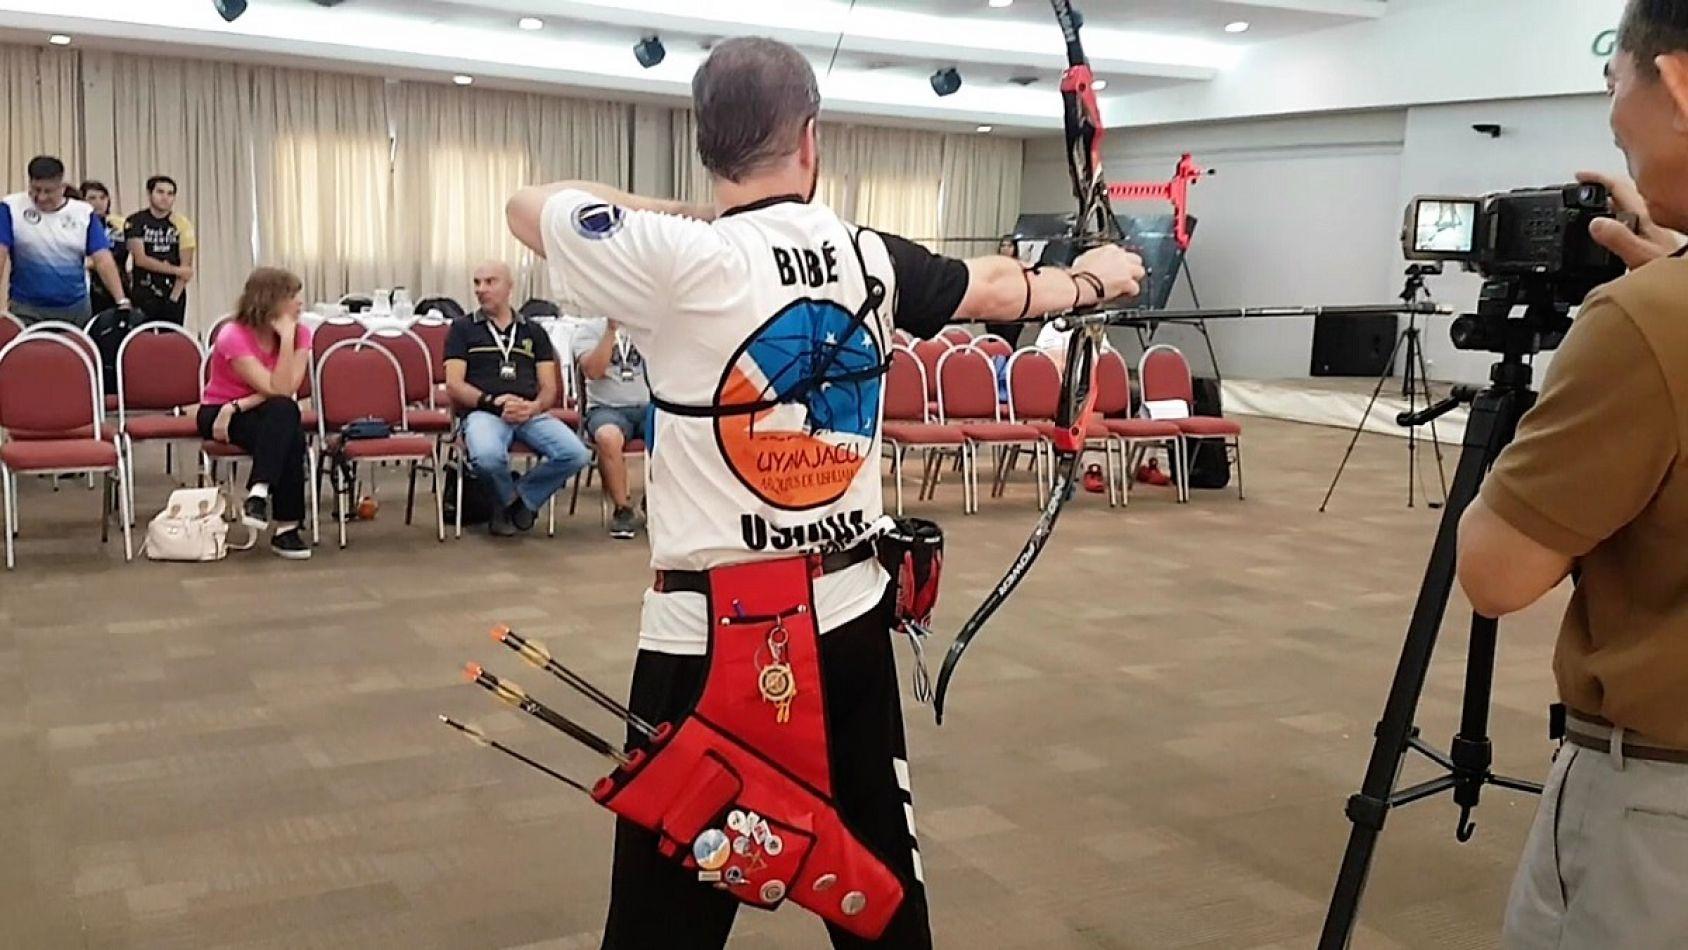 Arqueros fueguinos participaron de un seminario internacional